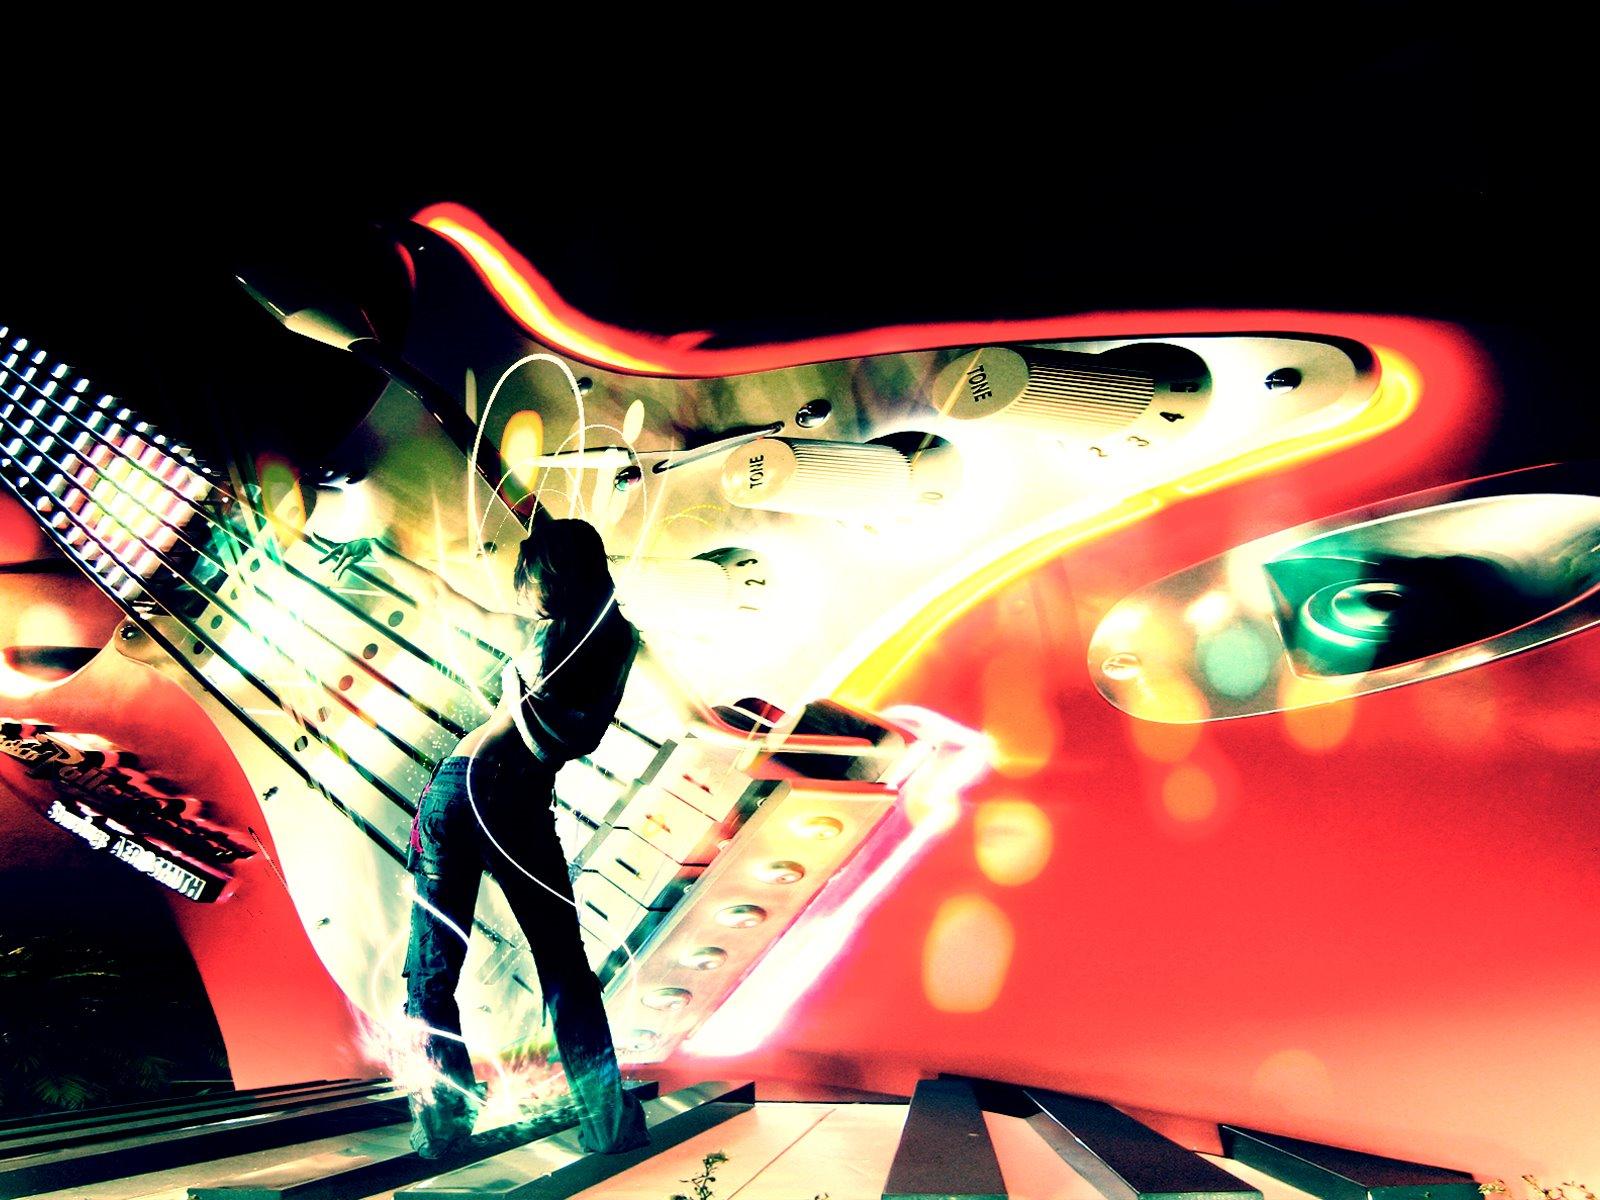 11 3D Designs Cool Music Images